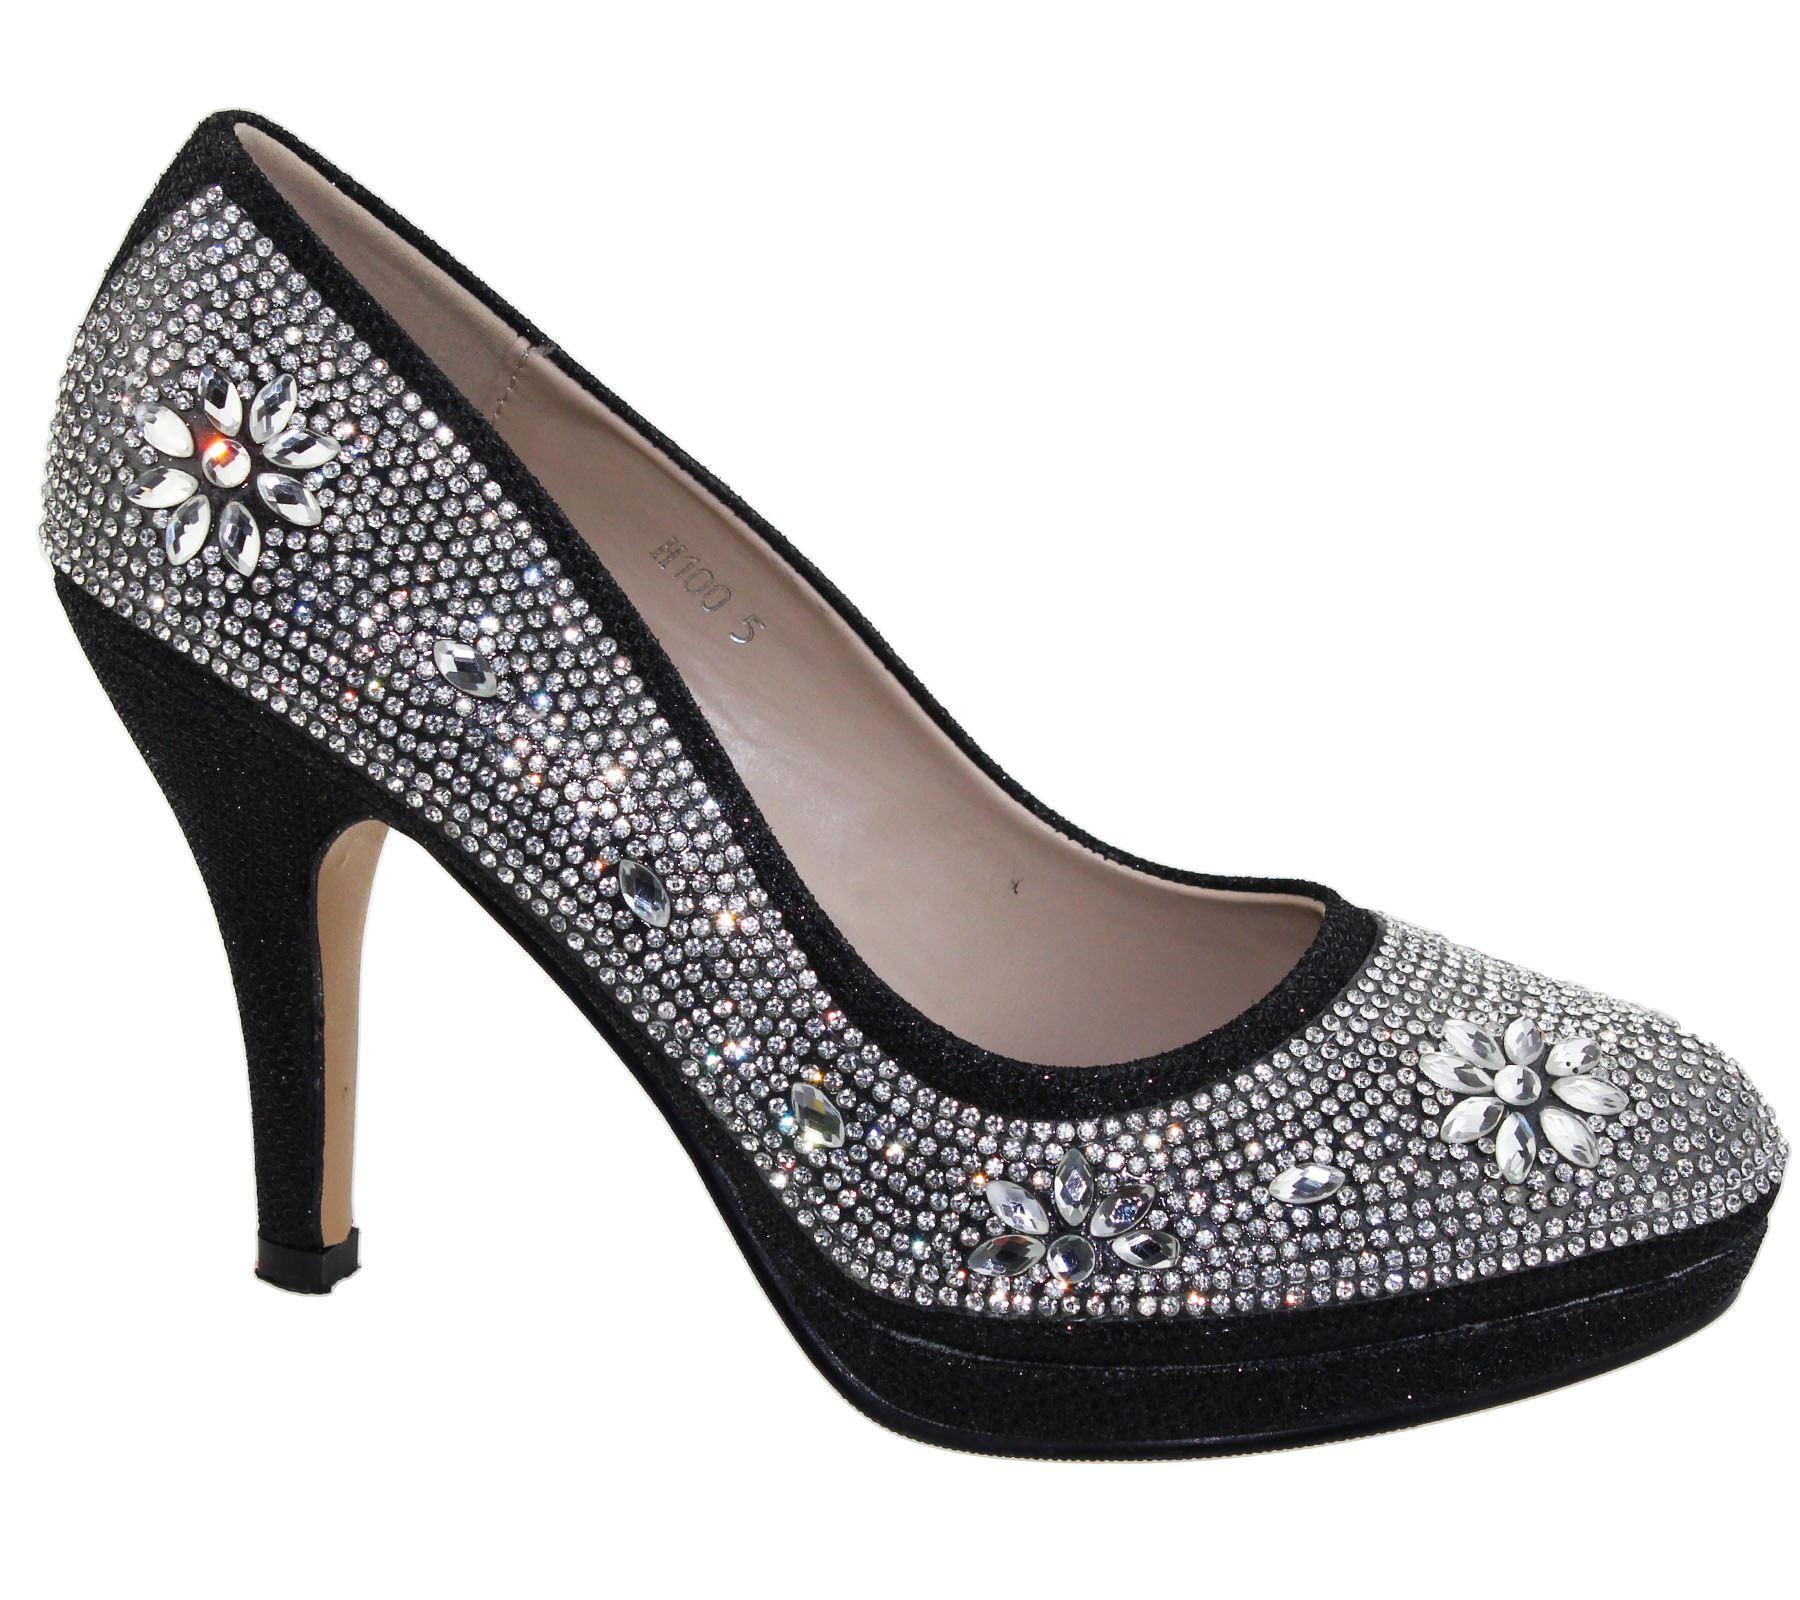 Womens-Platforms-High-Heels-Wedding-Bridal-Evening-Diamante-Ladies-Party-Shoes miniatura 7